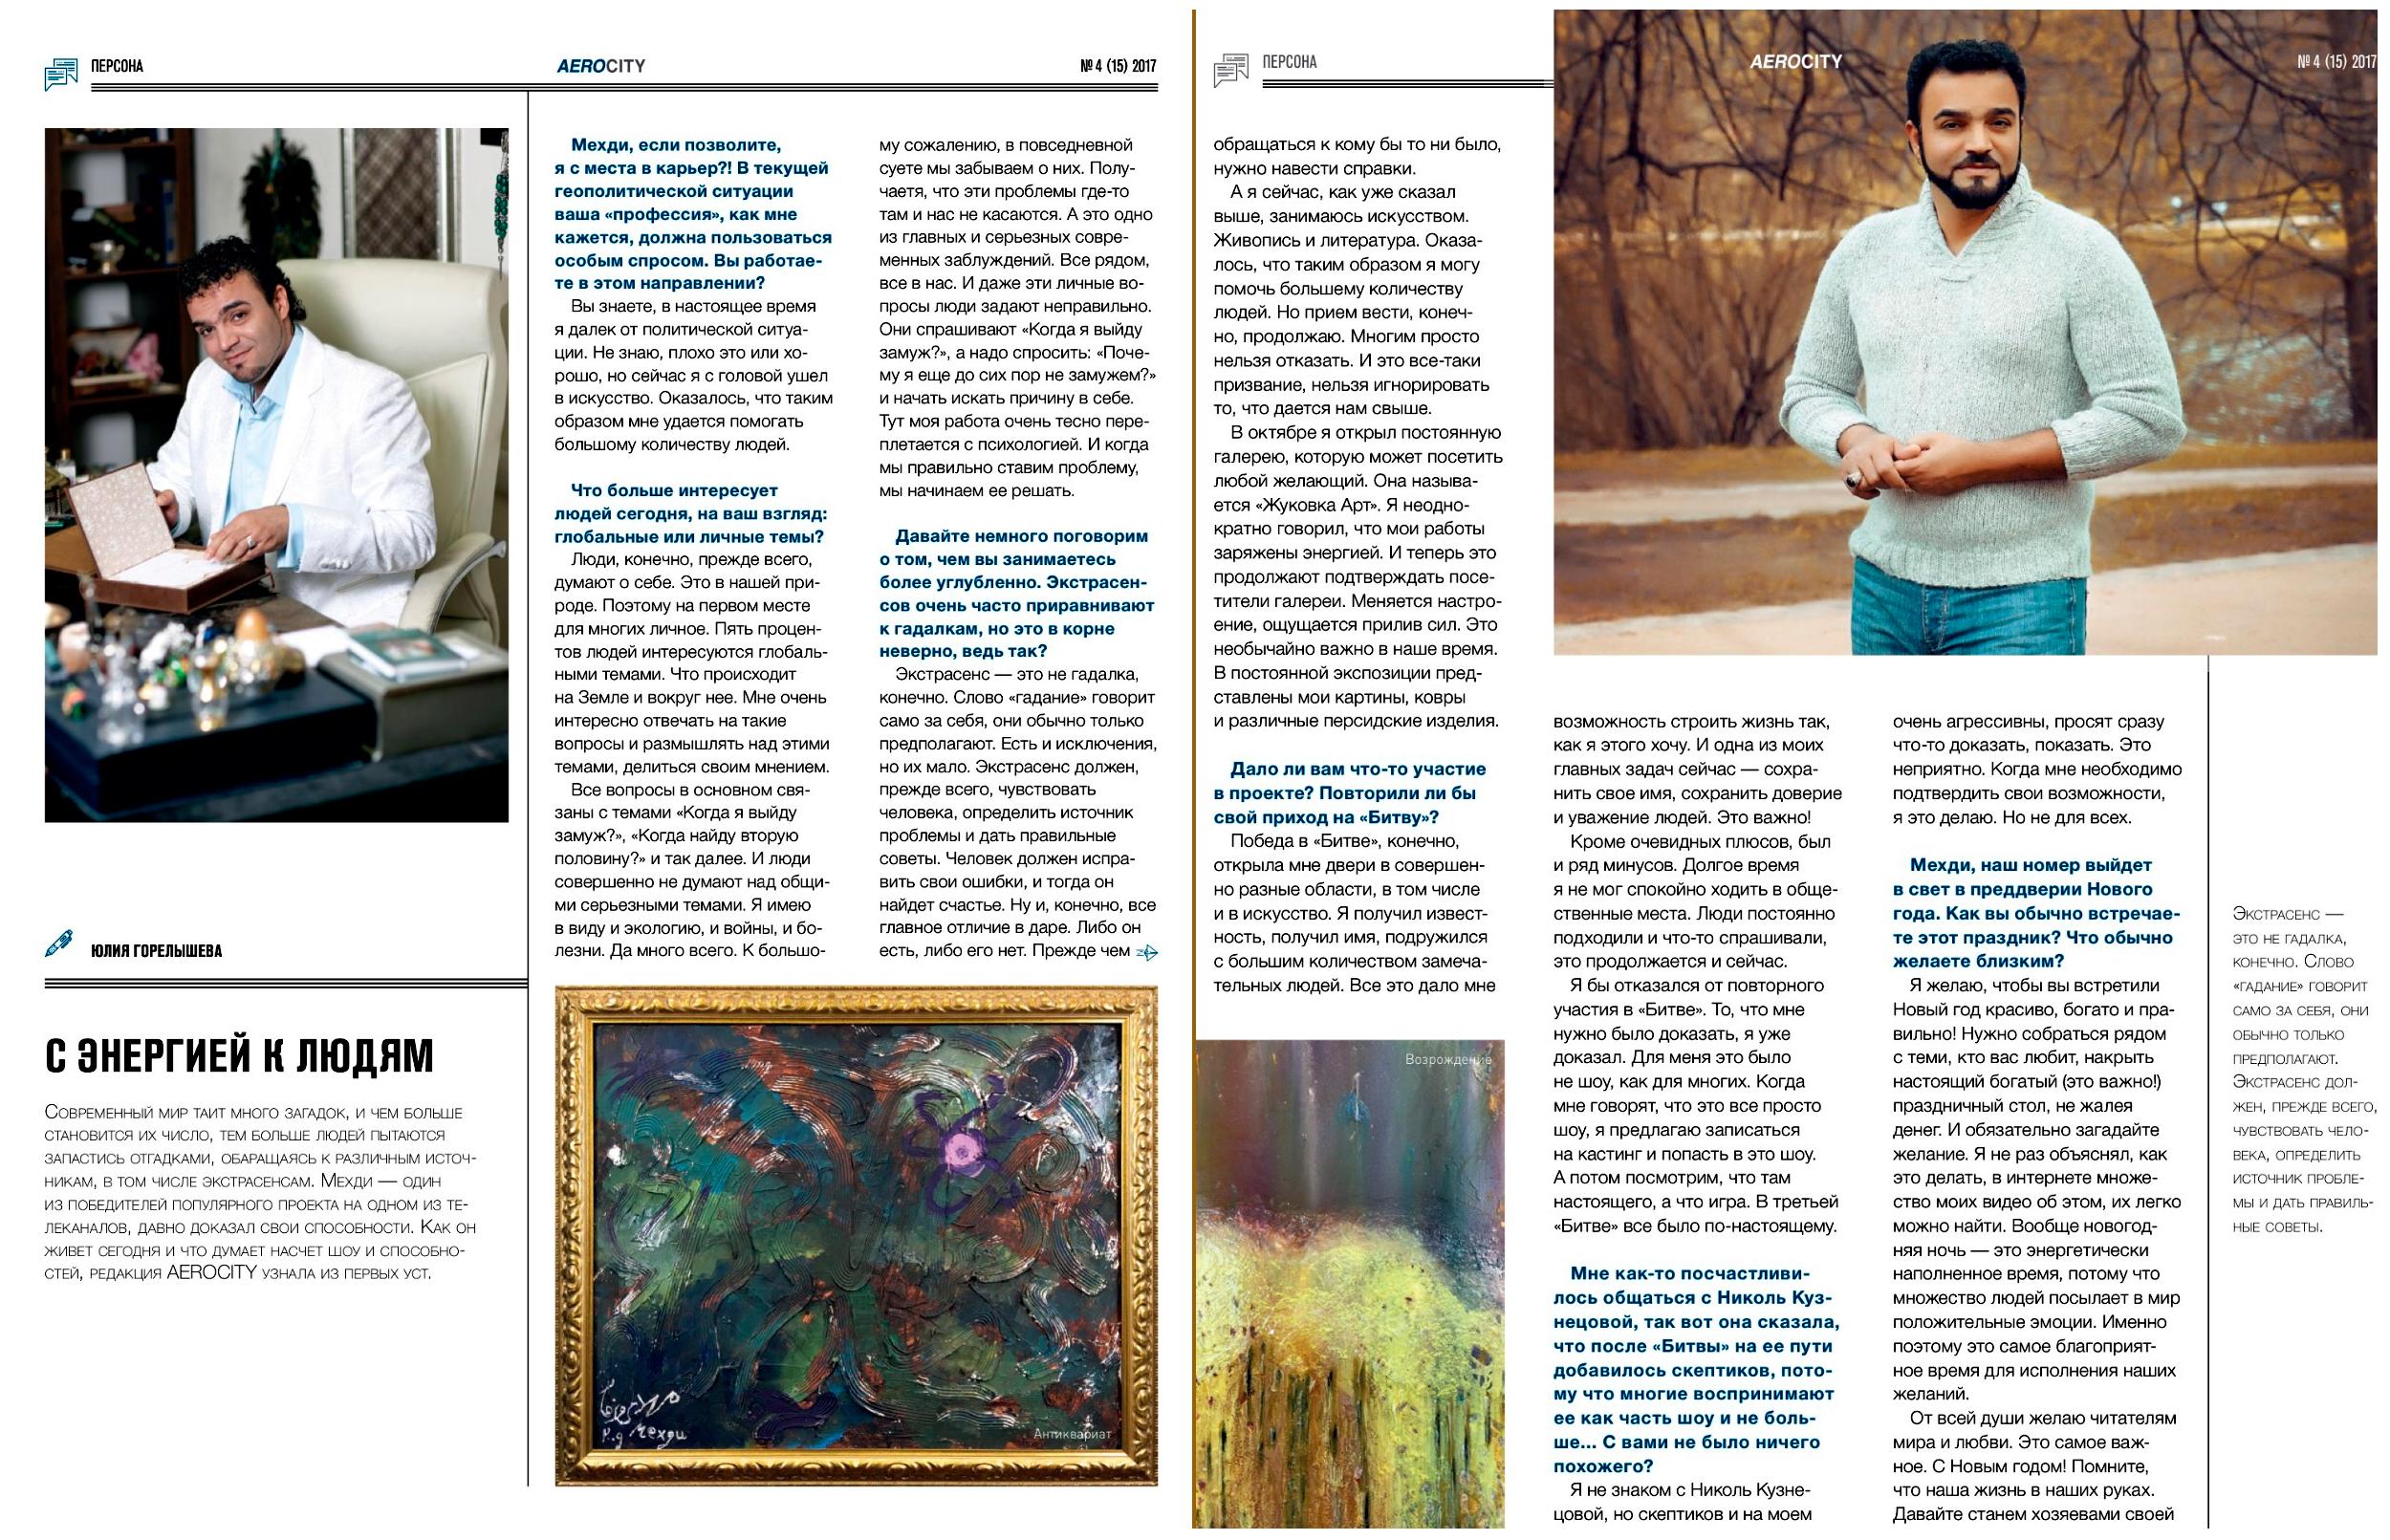 Интервью Мехди журналу «Aerocity»  4(15)  2017